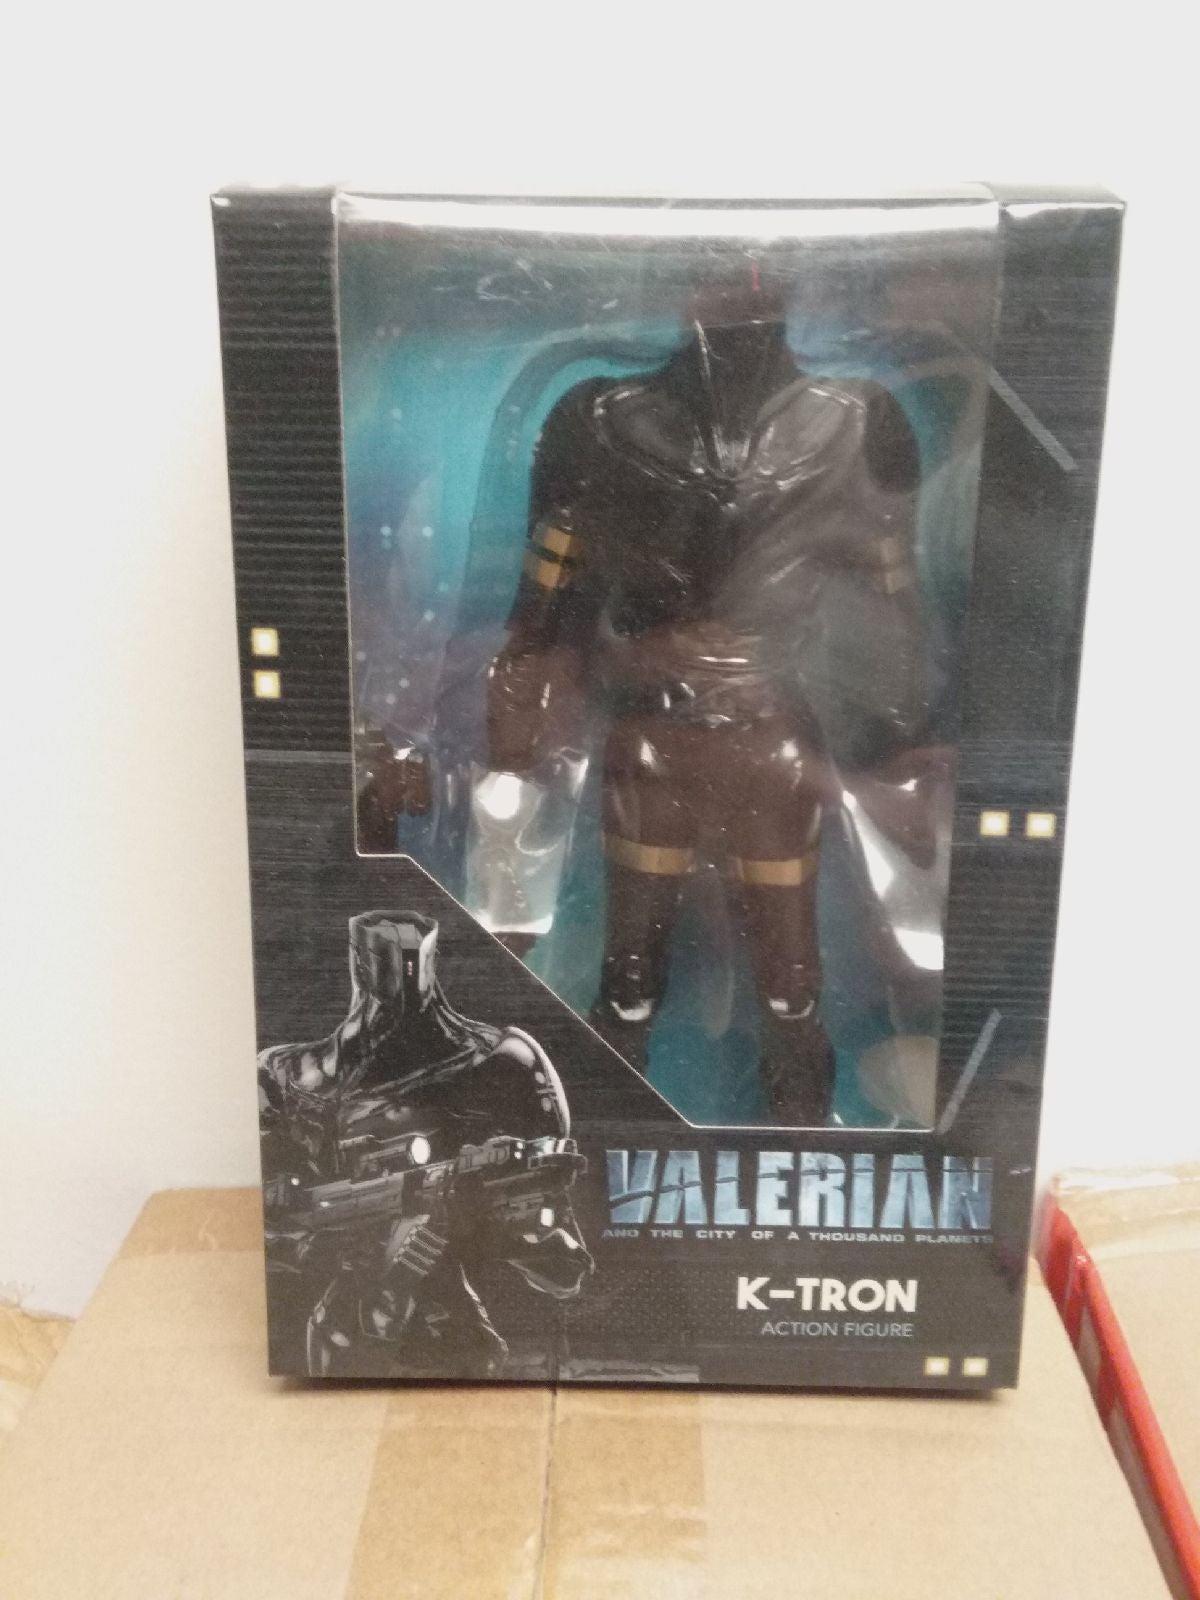 Neca Valerian K-Tron - New